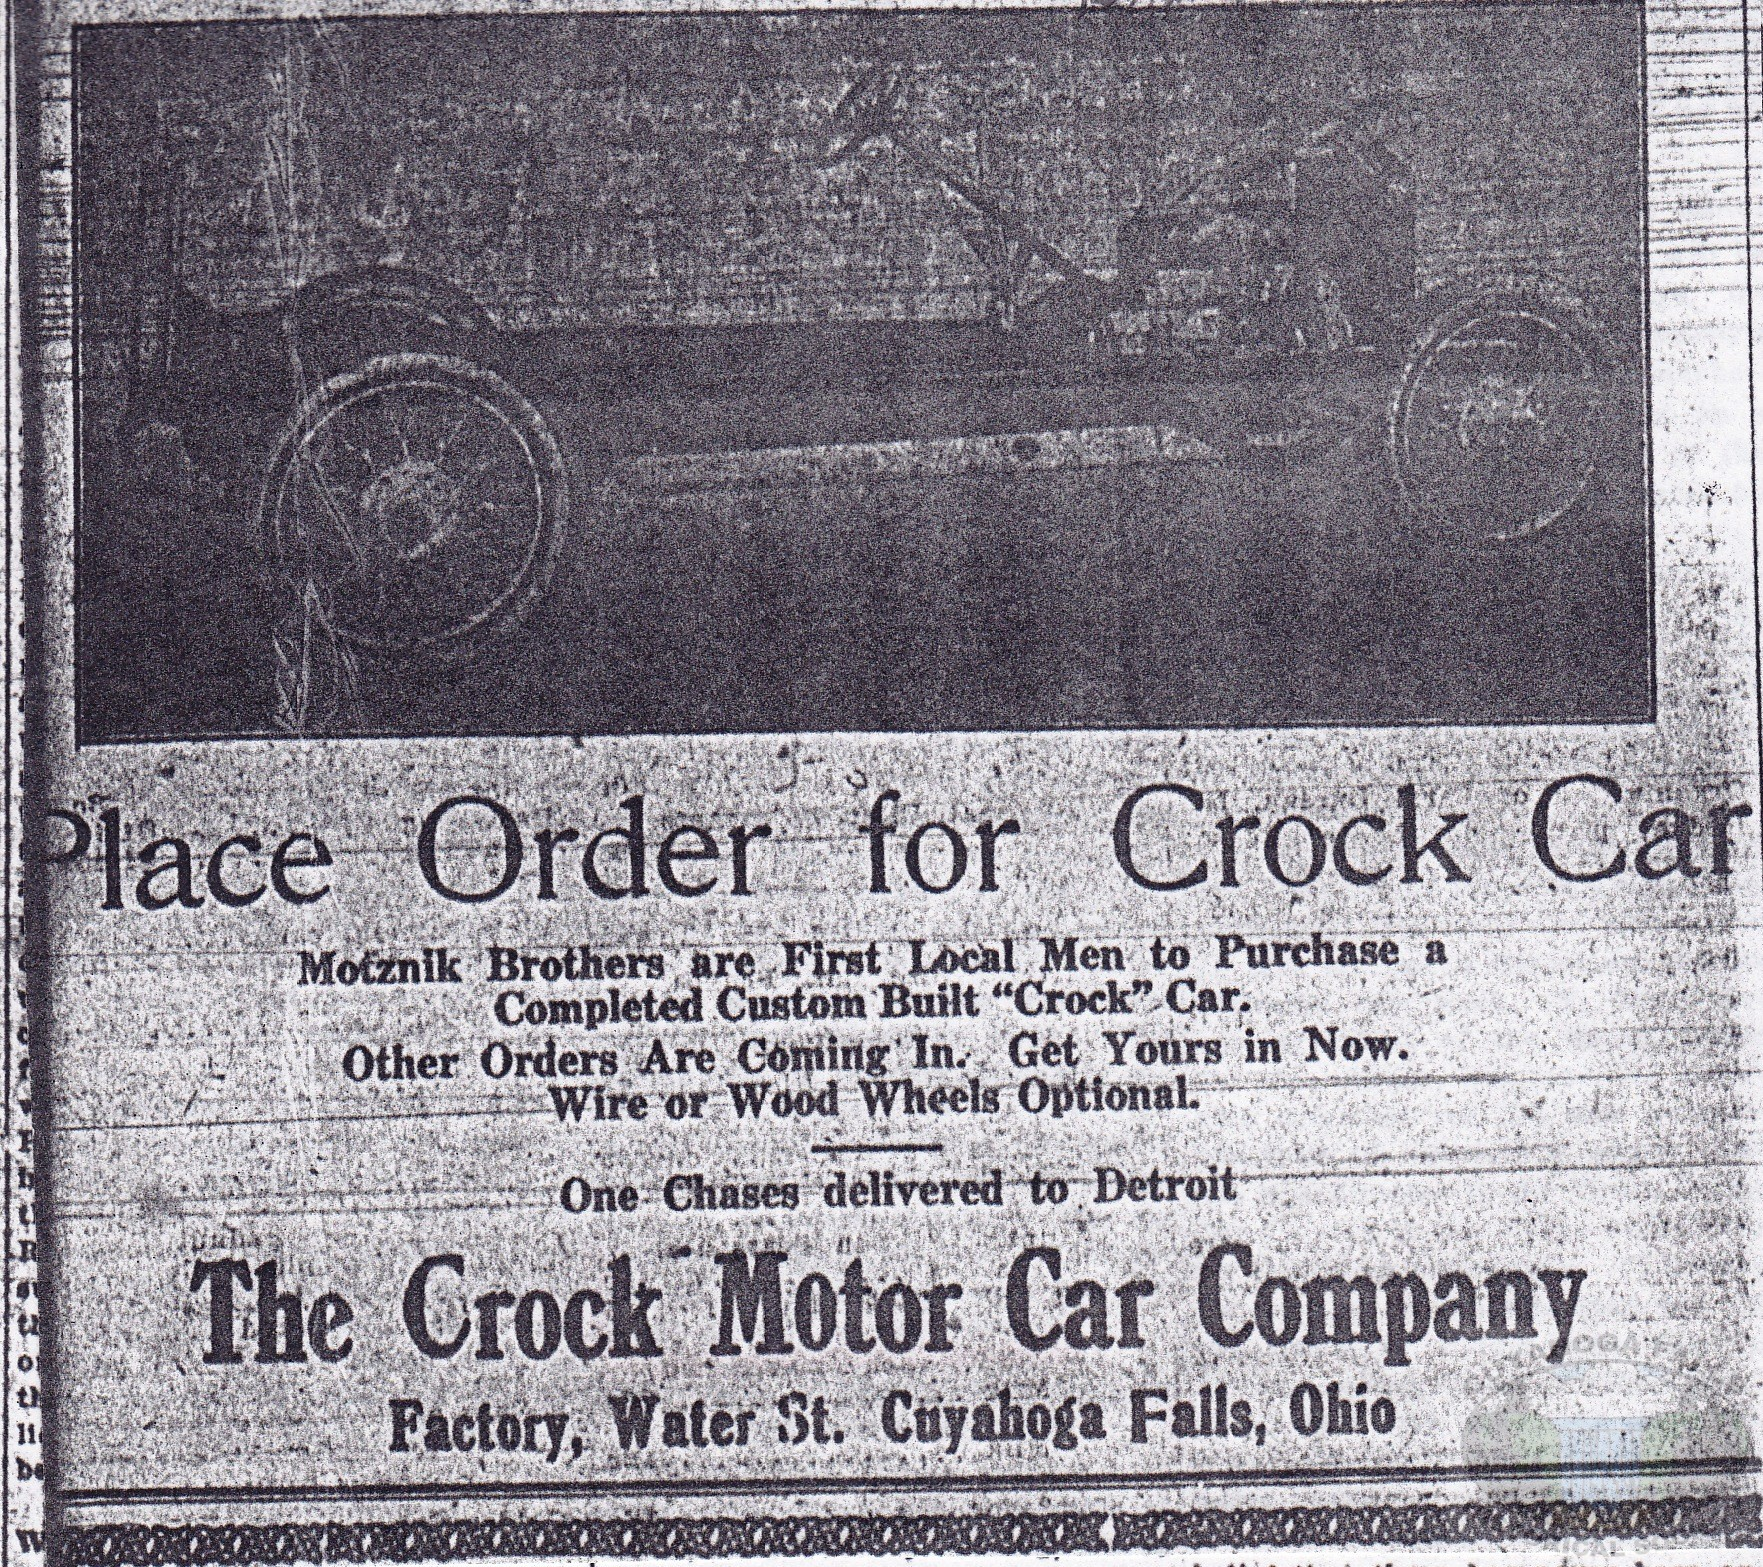 Crock Car Manufacturers in Cuyahoga Falls